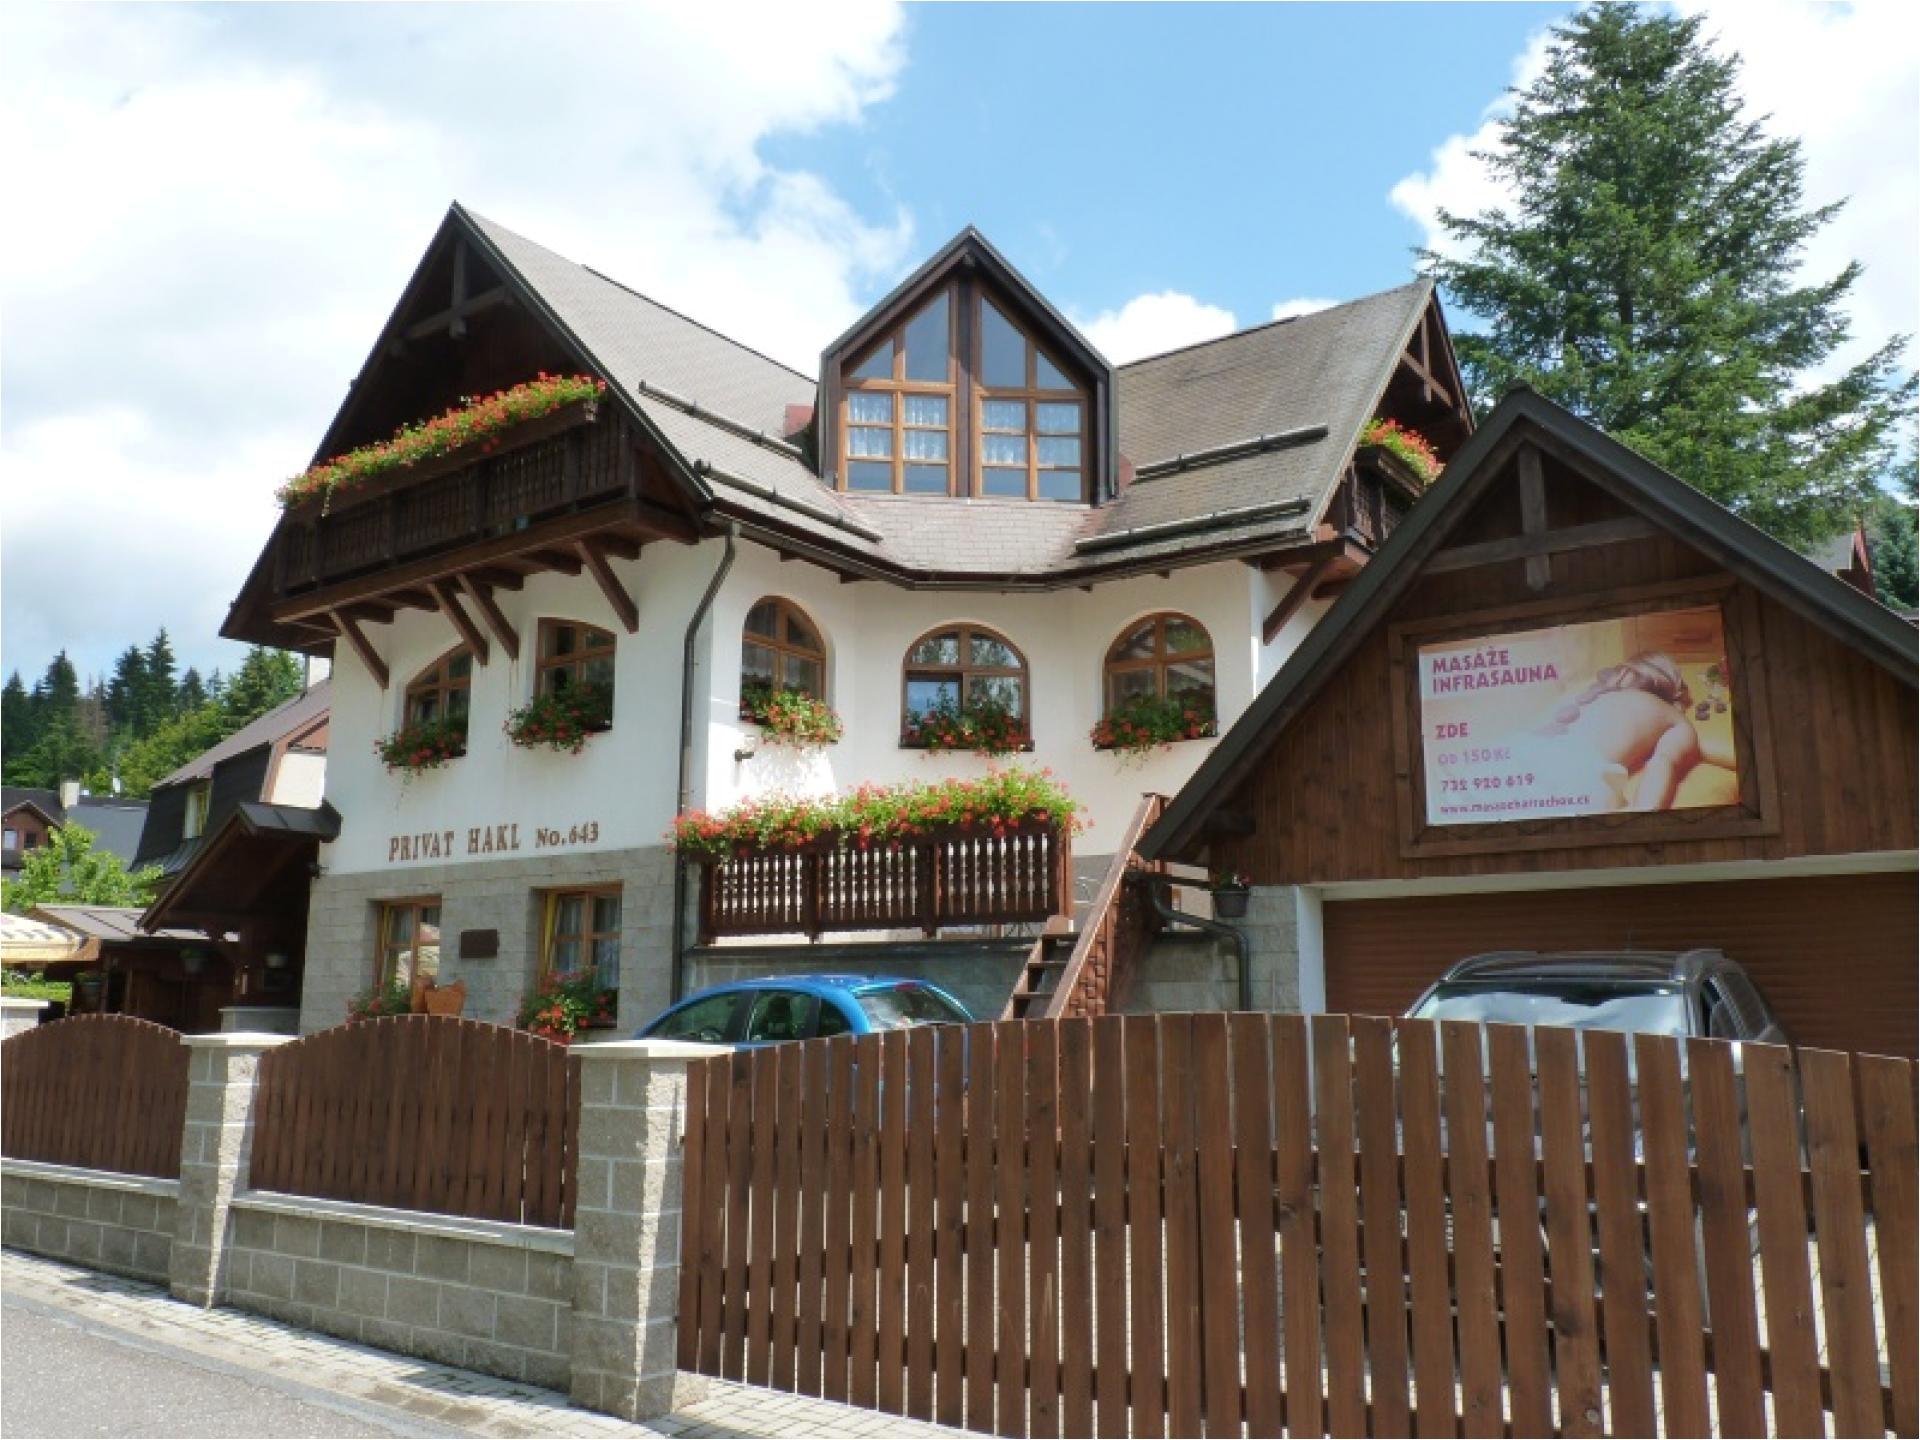 fantastic house for rent in winter garden fl on homes for sale in winter garden beautiful privat hakl harrachov info